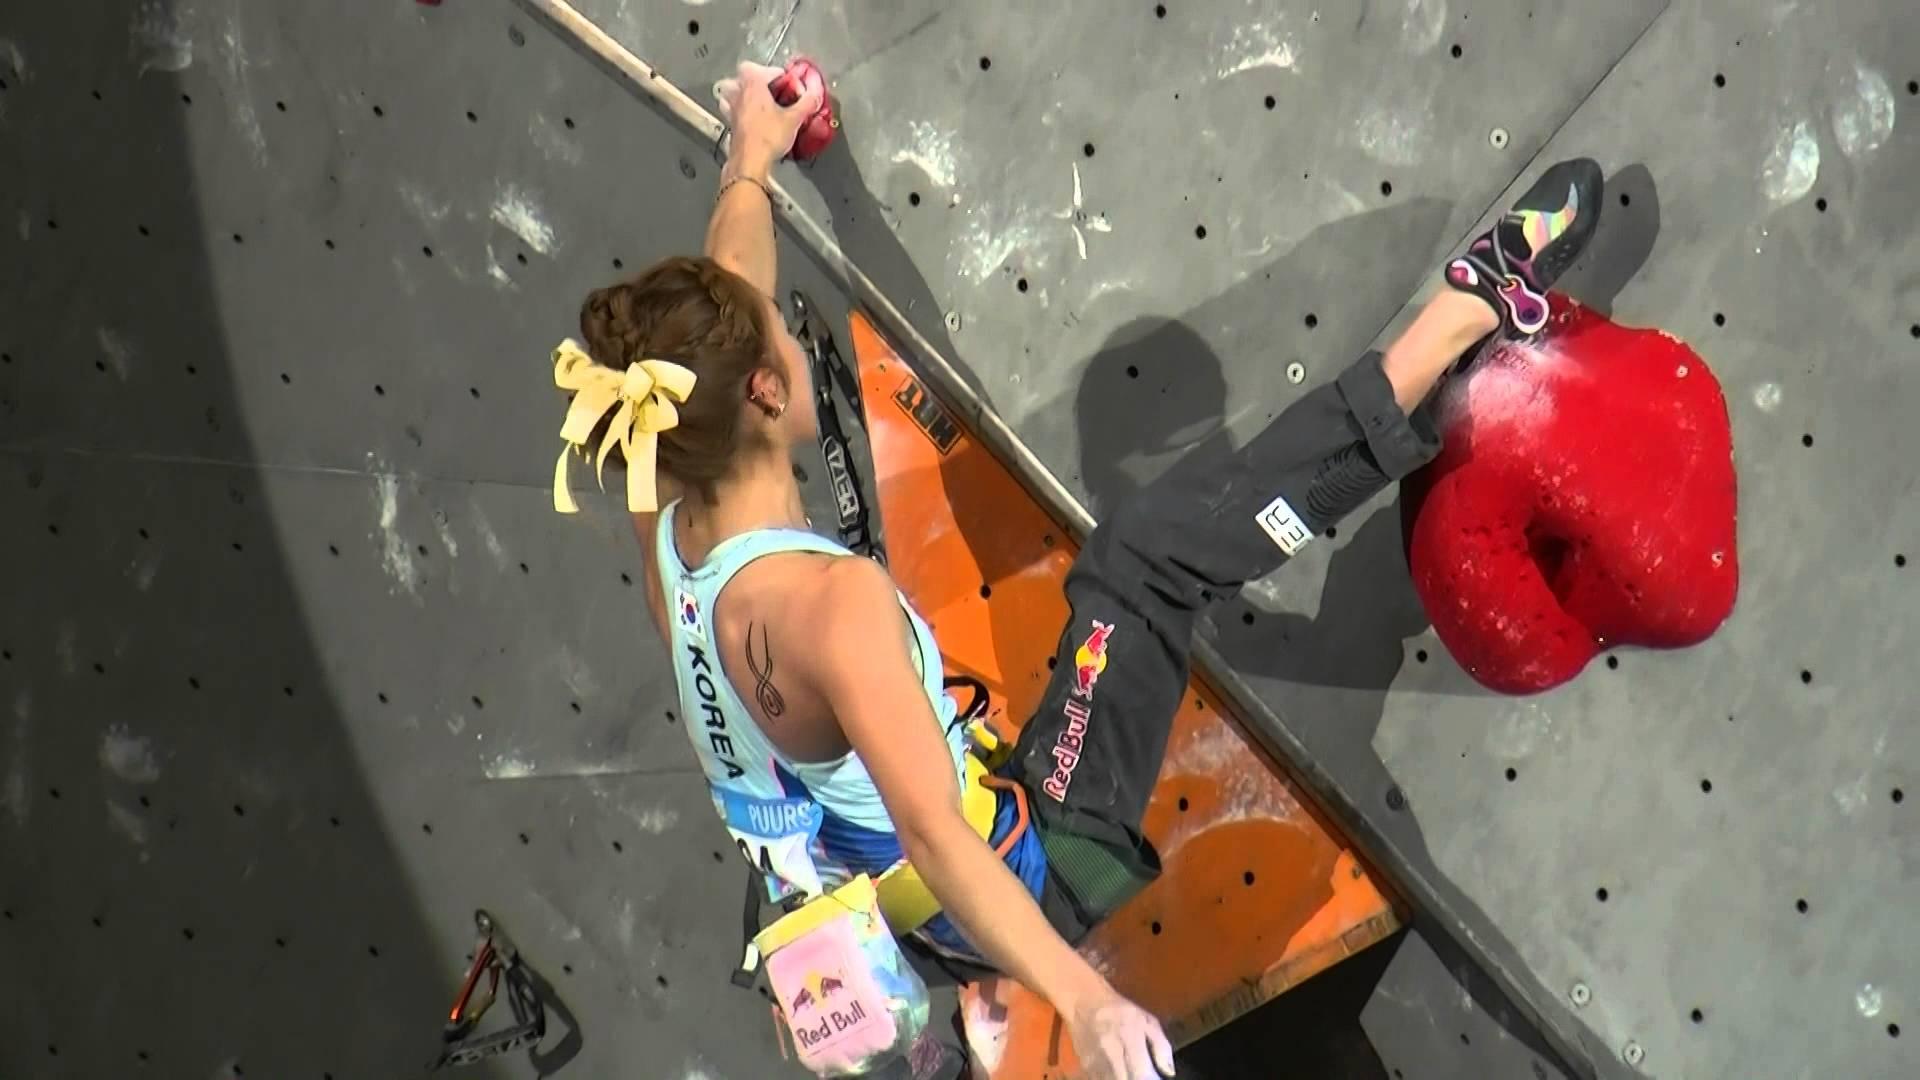 Oliunìd ranking: i 10 arrampicatori con i look più stravaganti